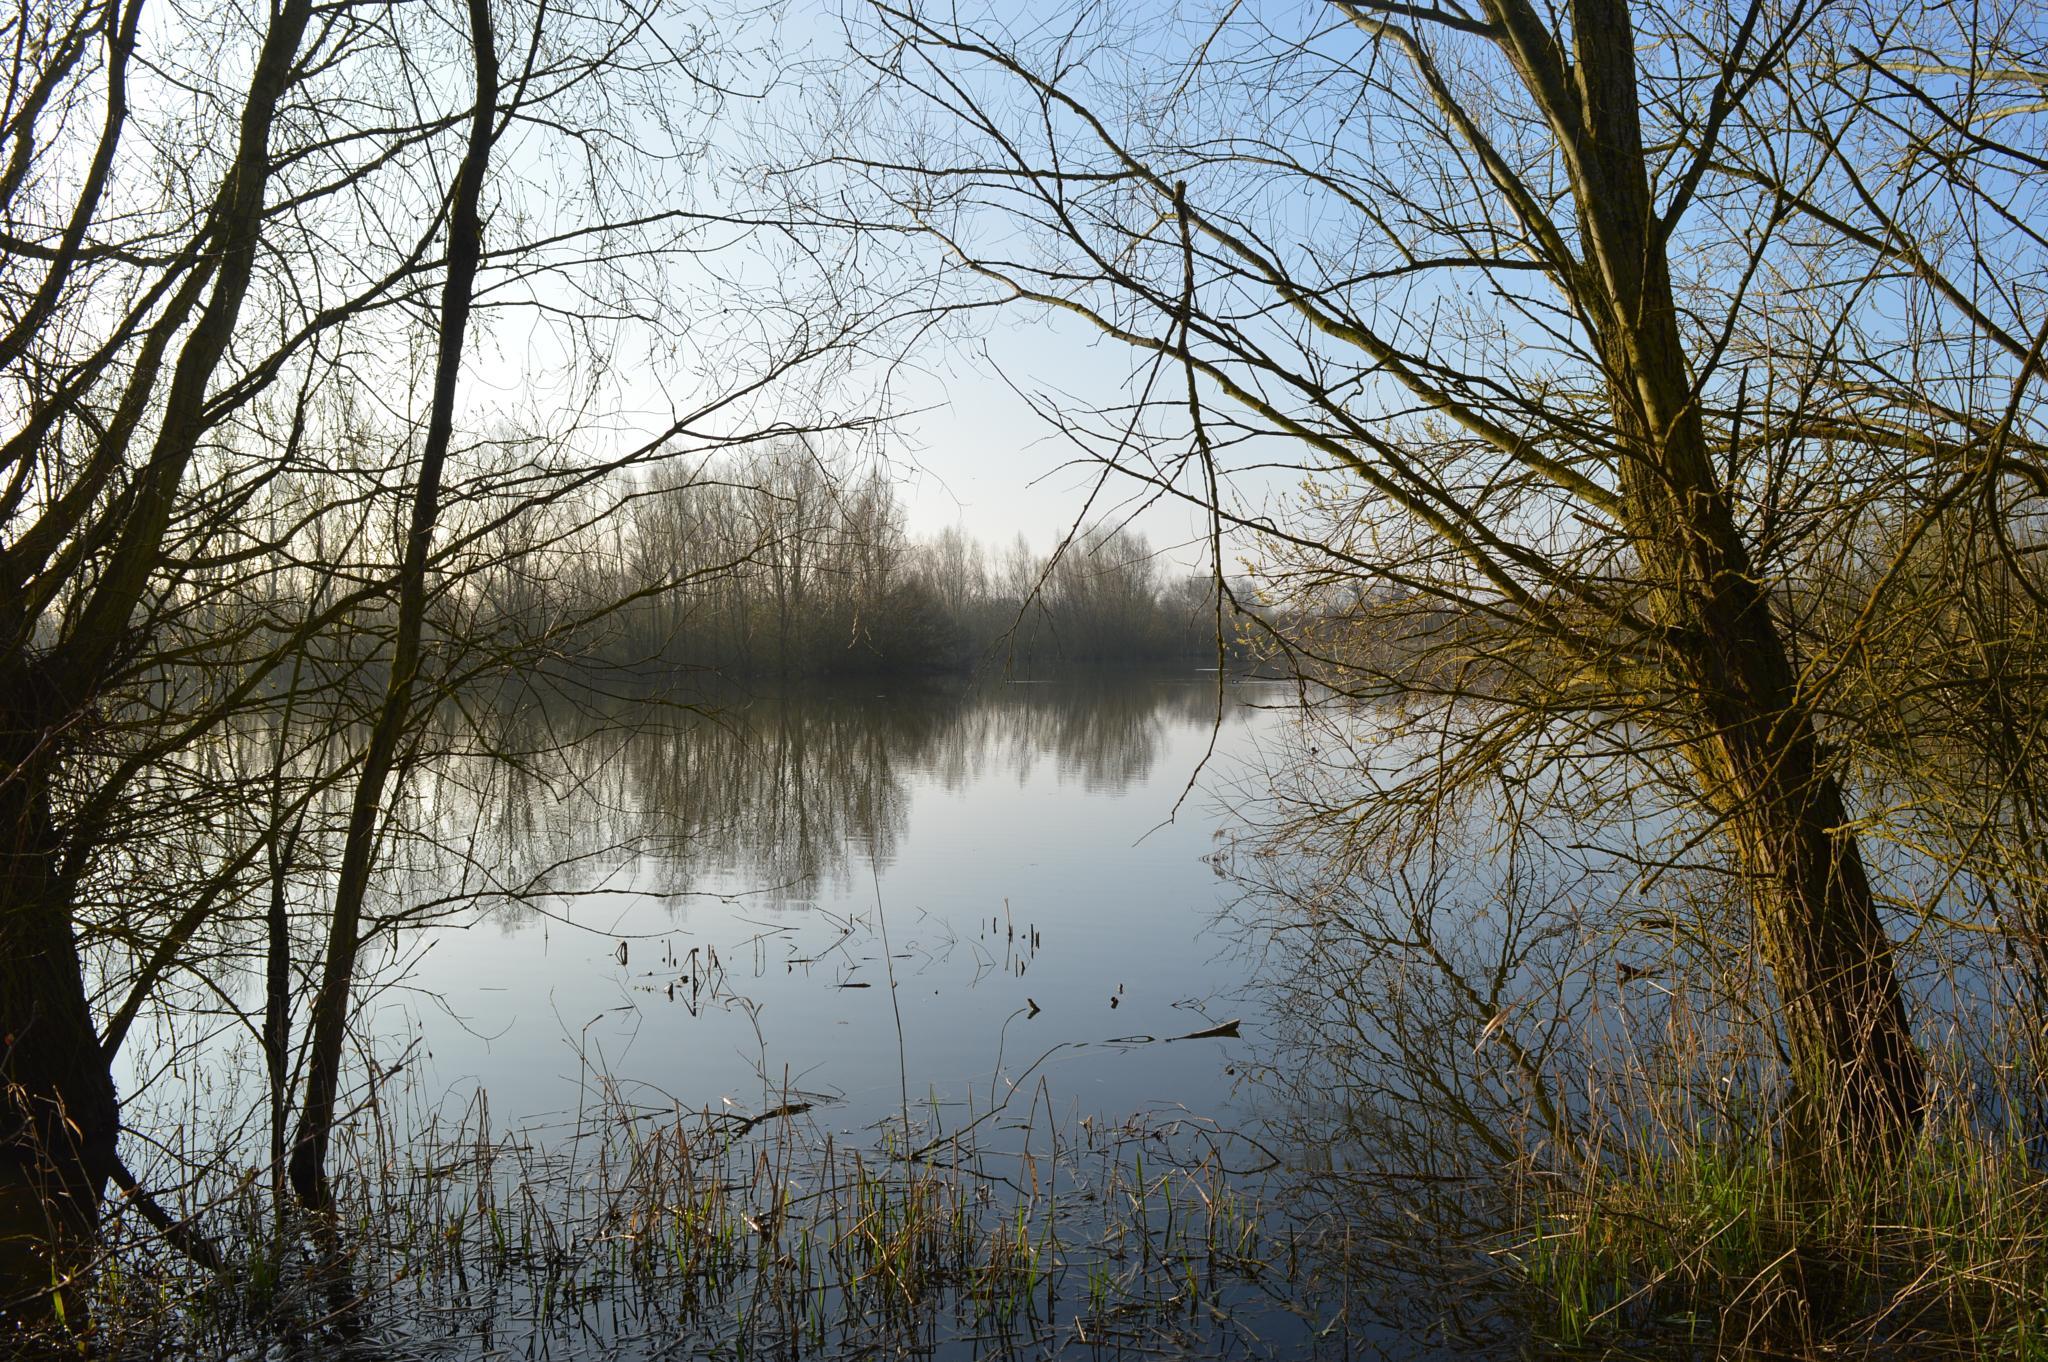 Summer Leys Nature Reserve by JaneFenner